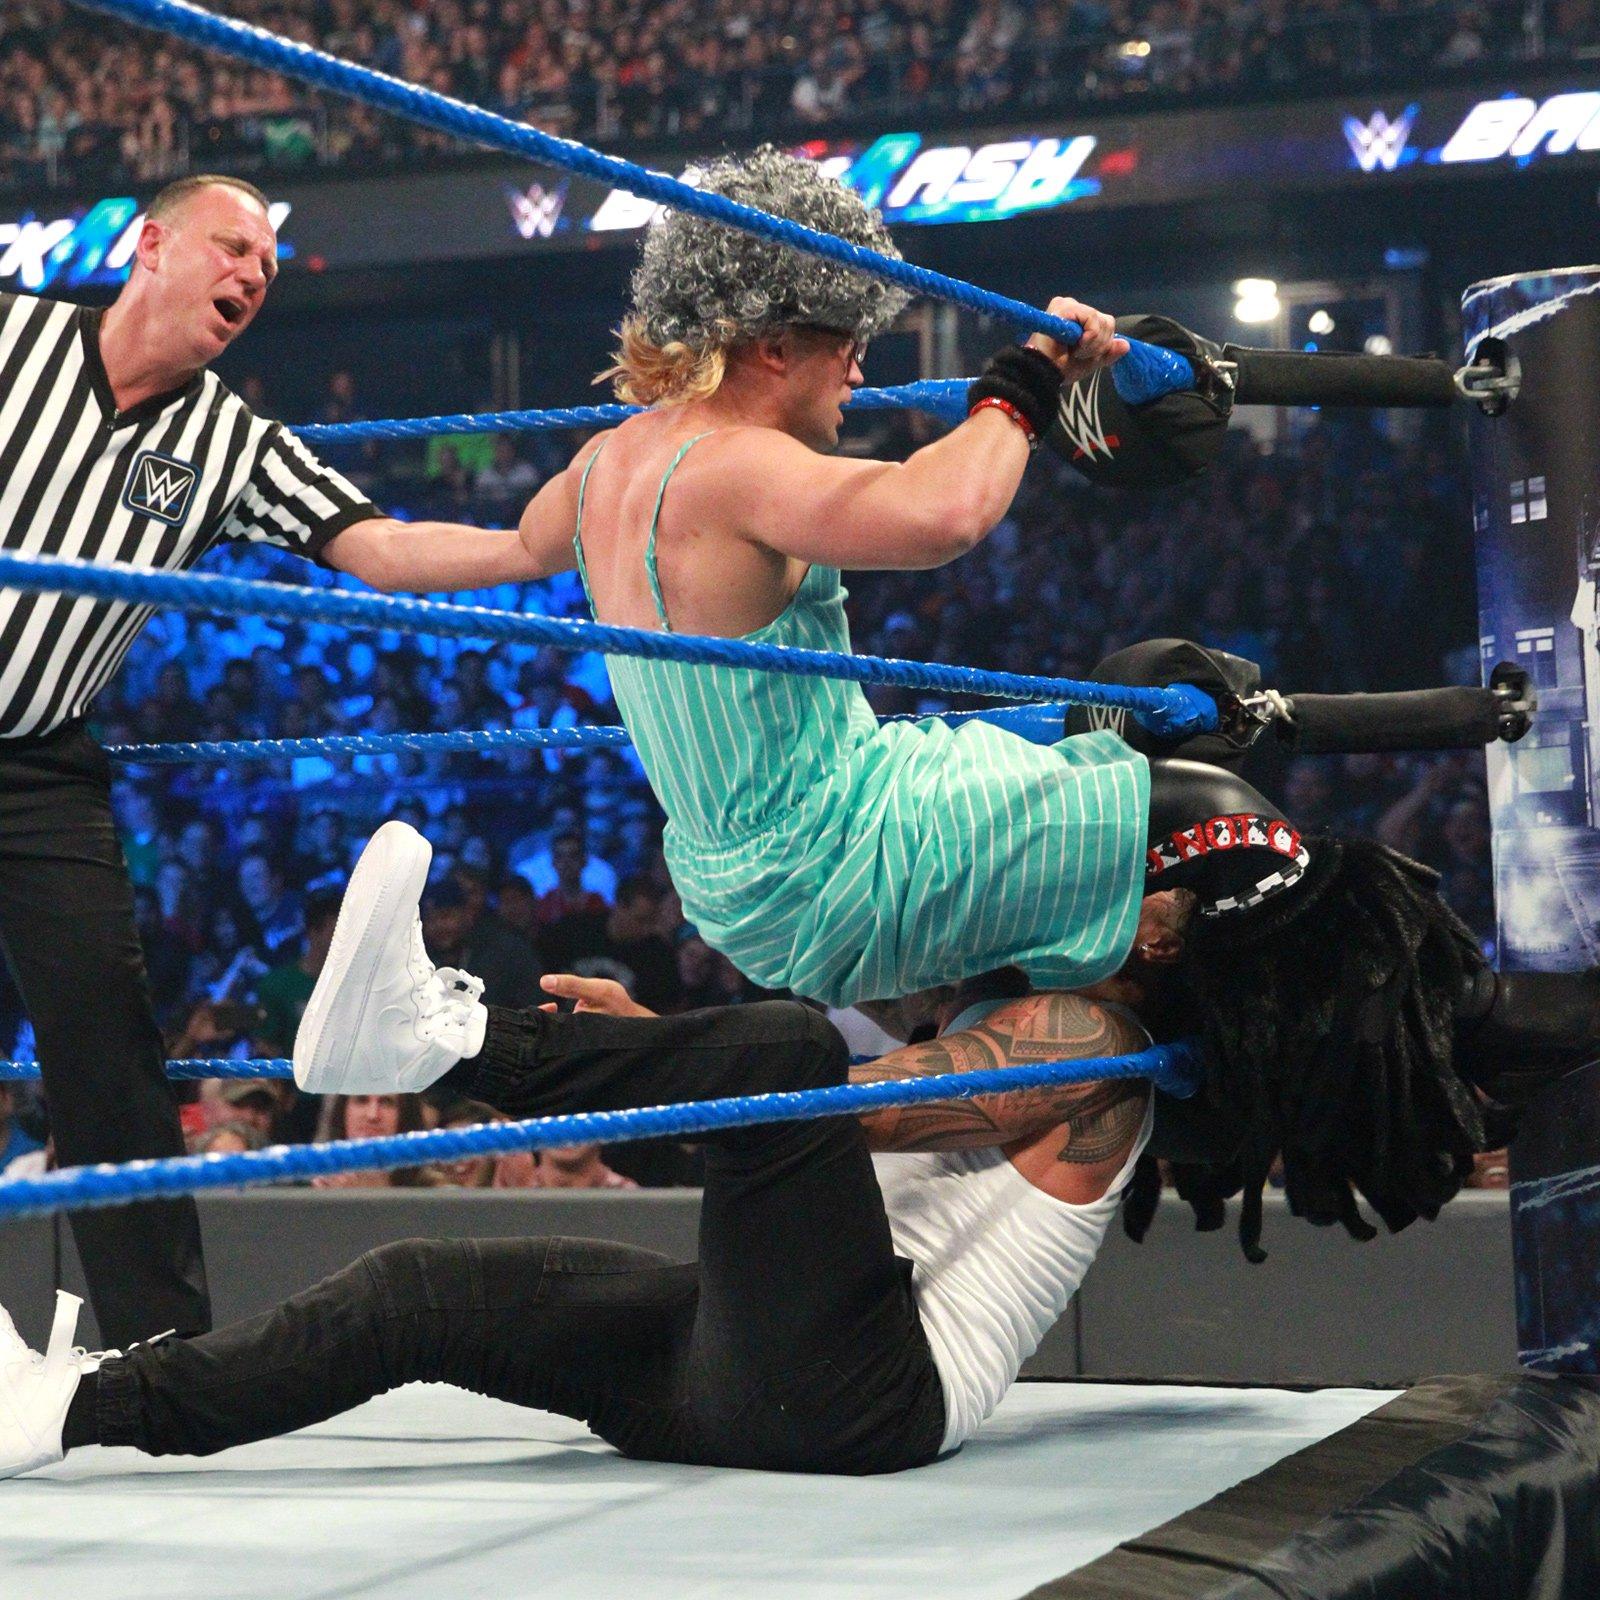 Grandma Breeze shows off some impressive in-ring ability.